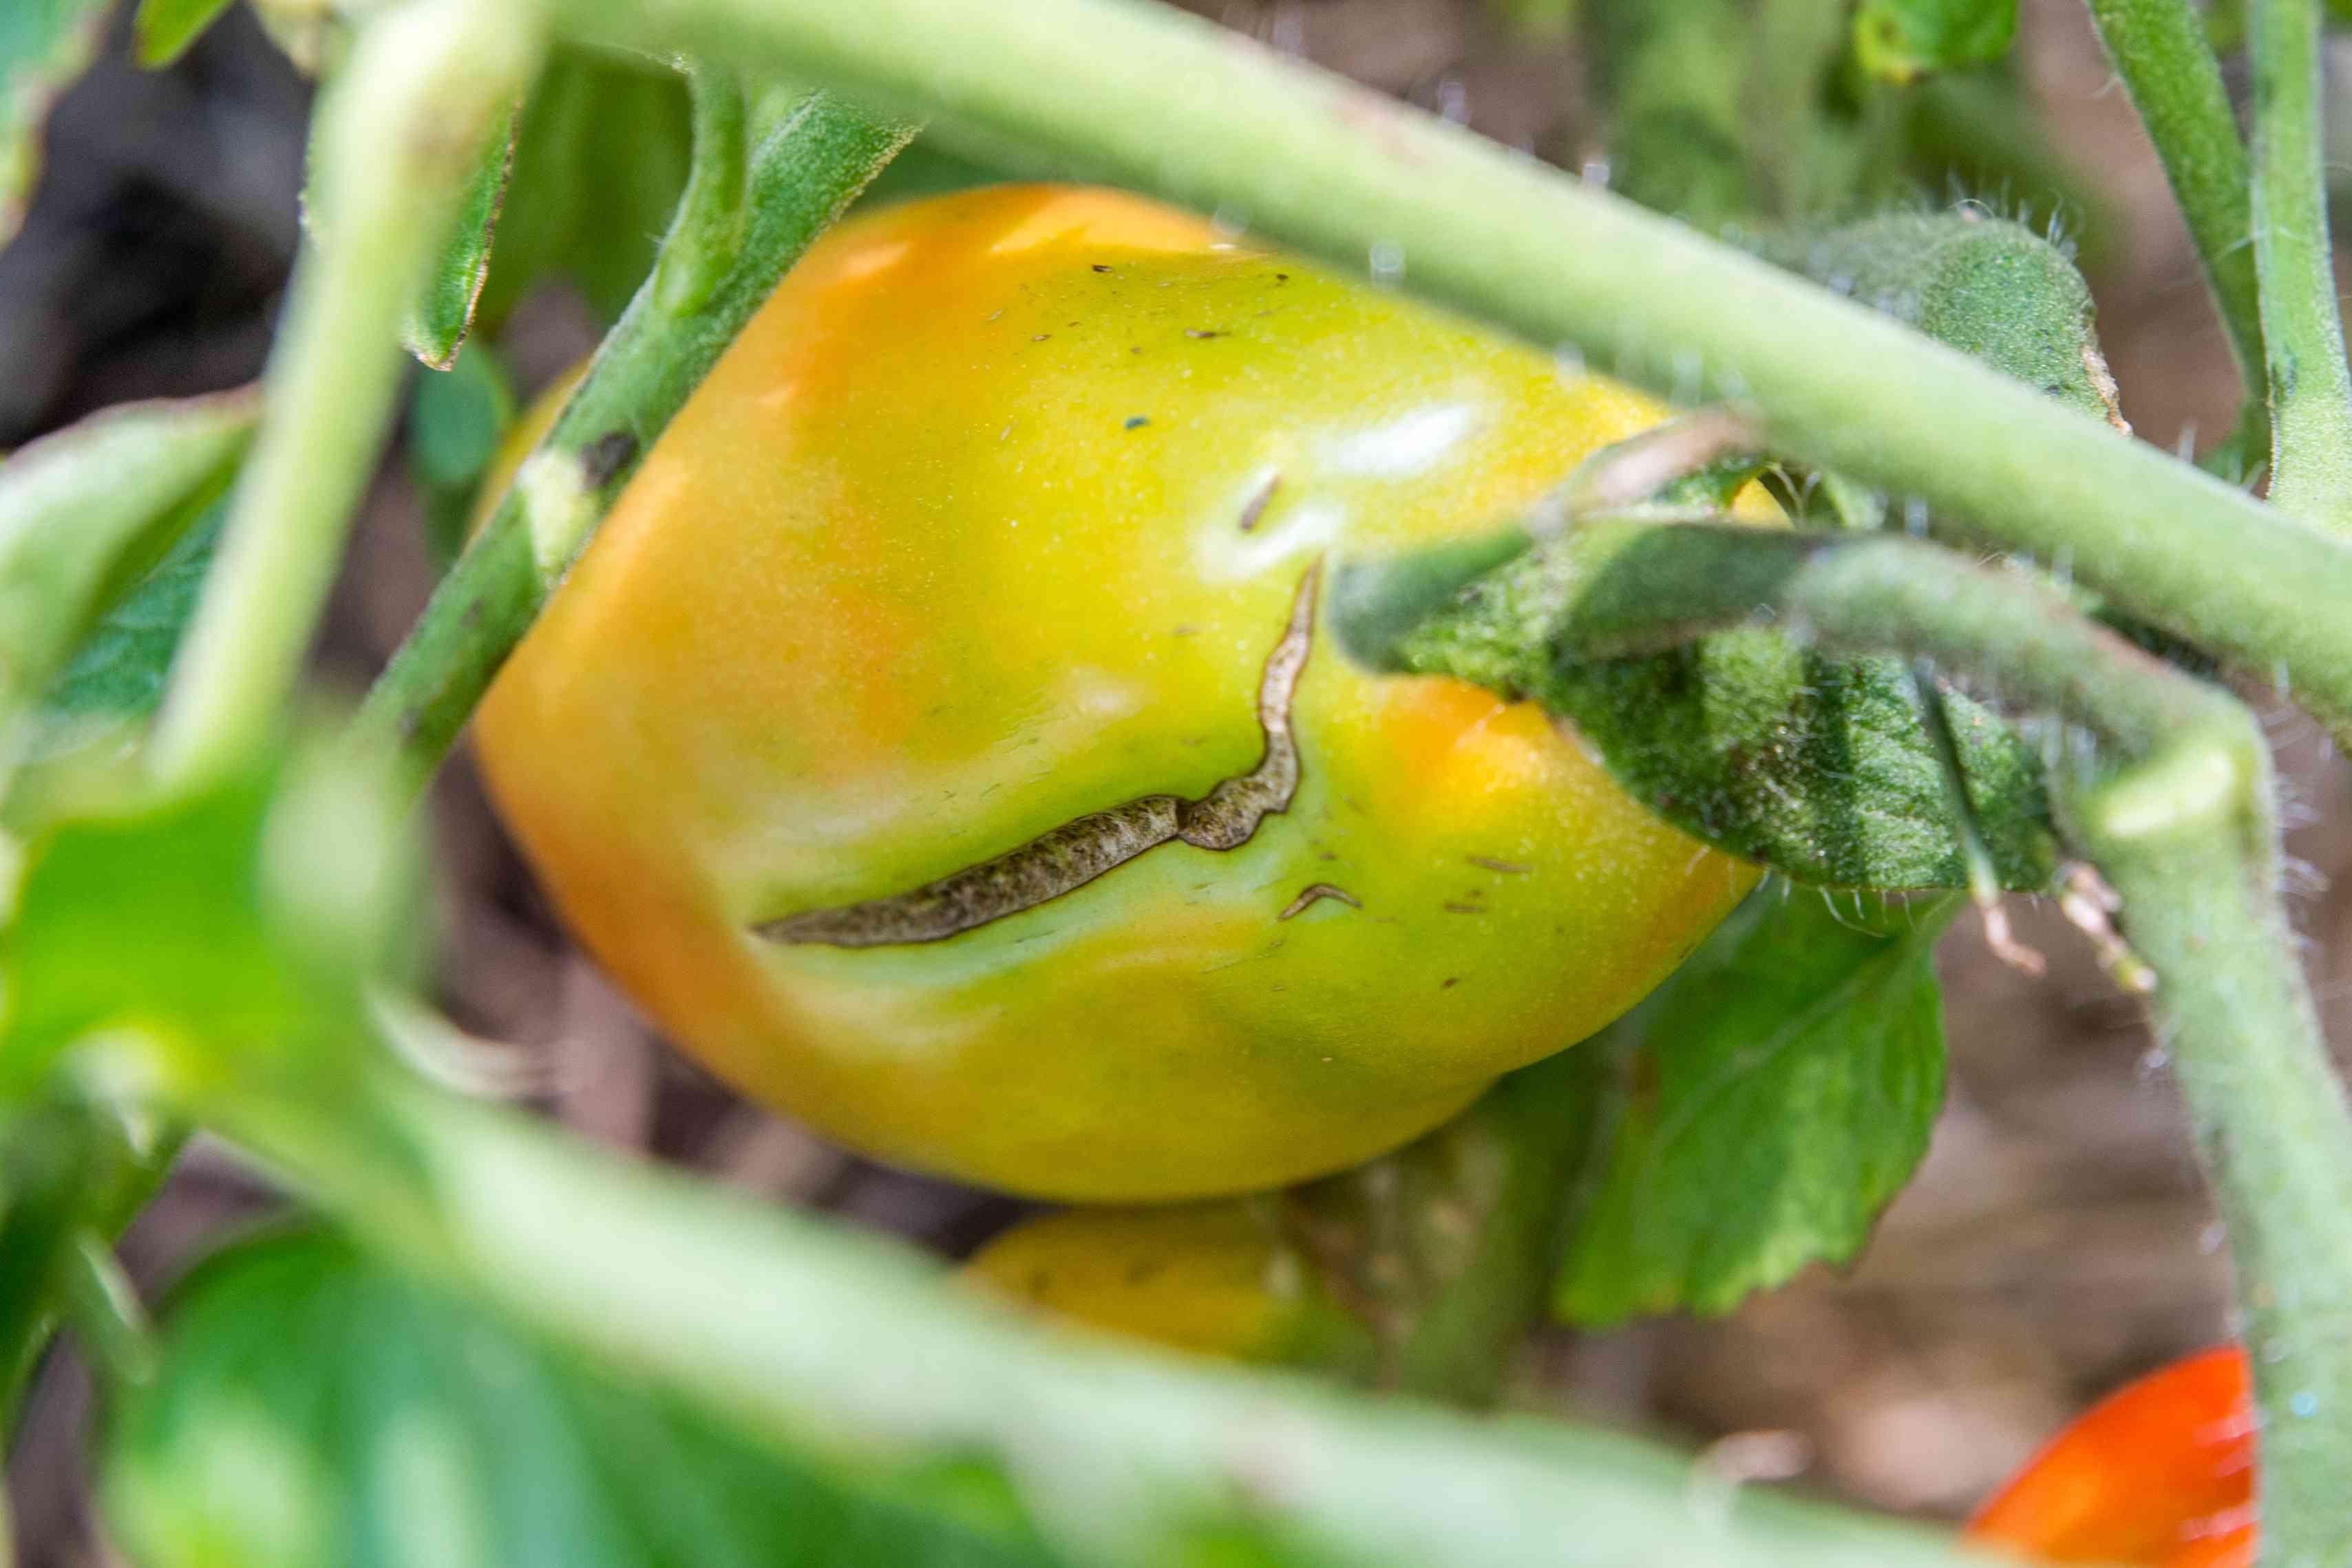 closeup of a tomato split